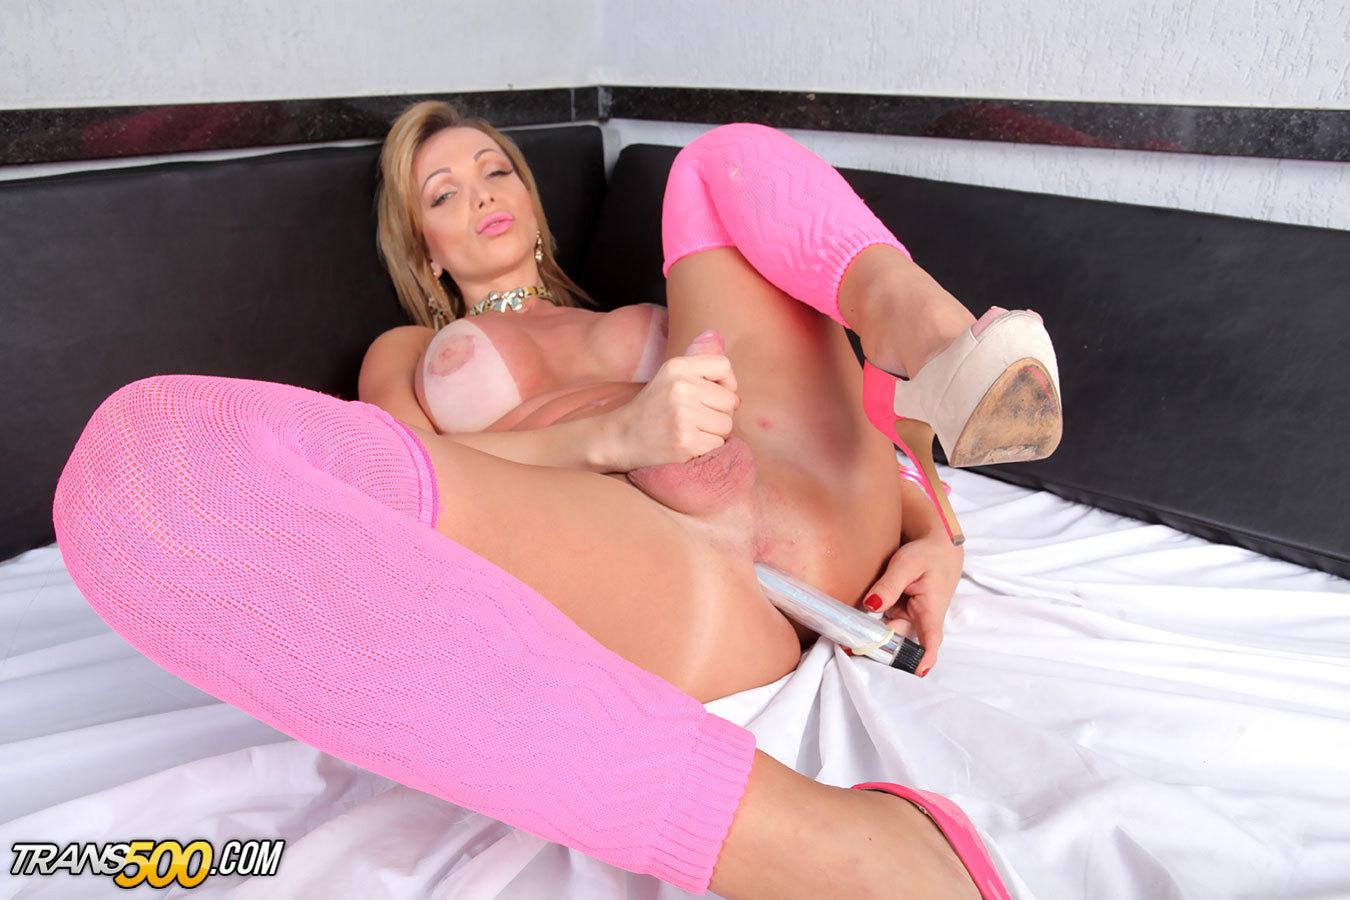 The Beautiful Carla Novaes Enjoys Having Some Solo Fun!